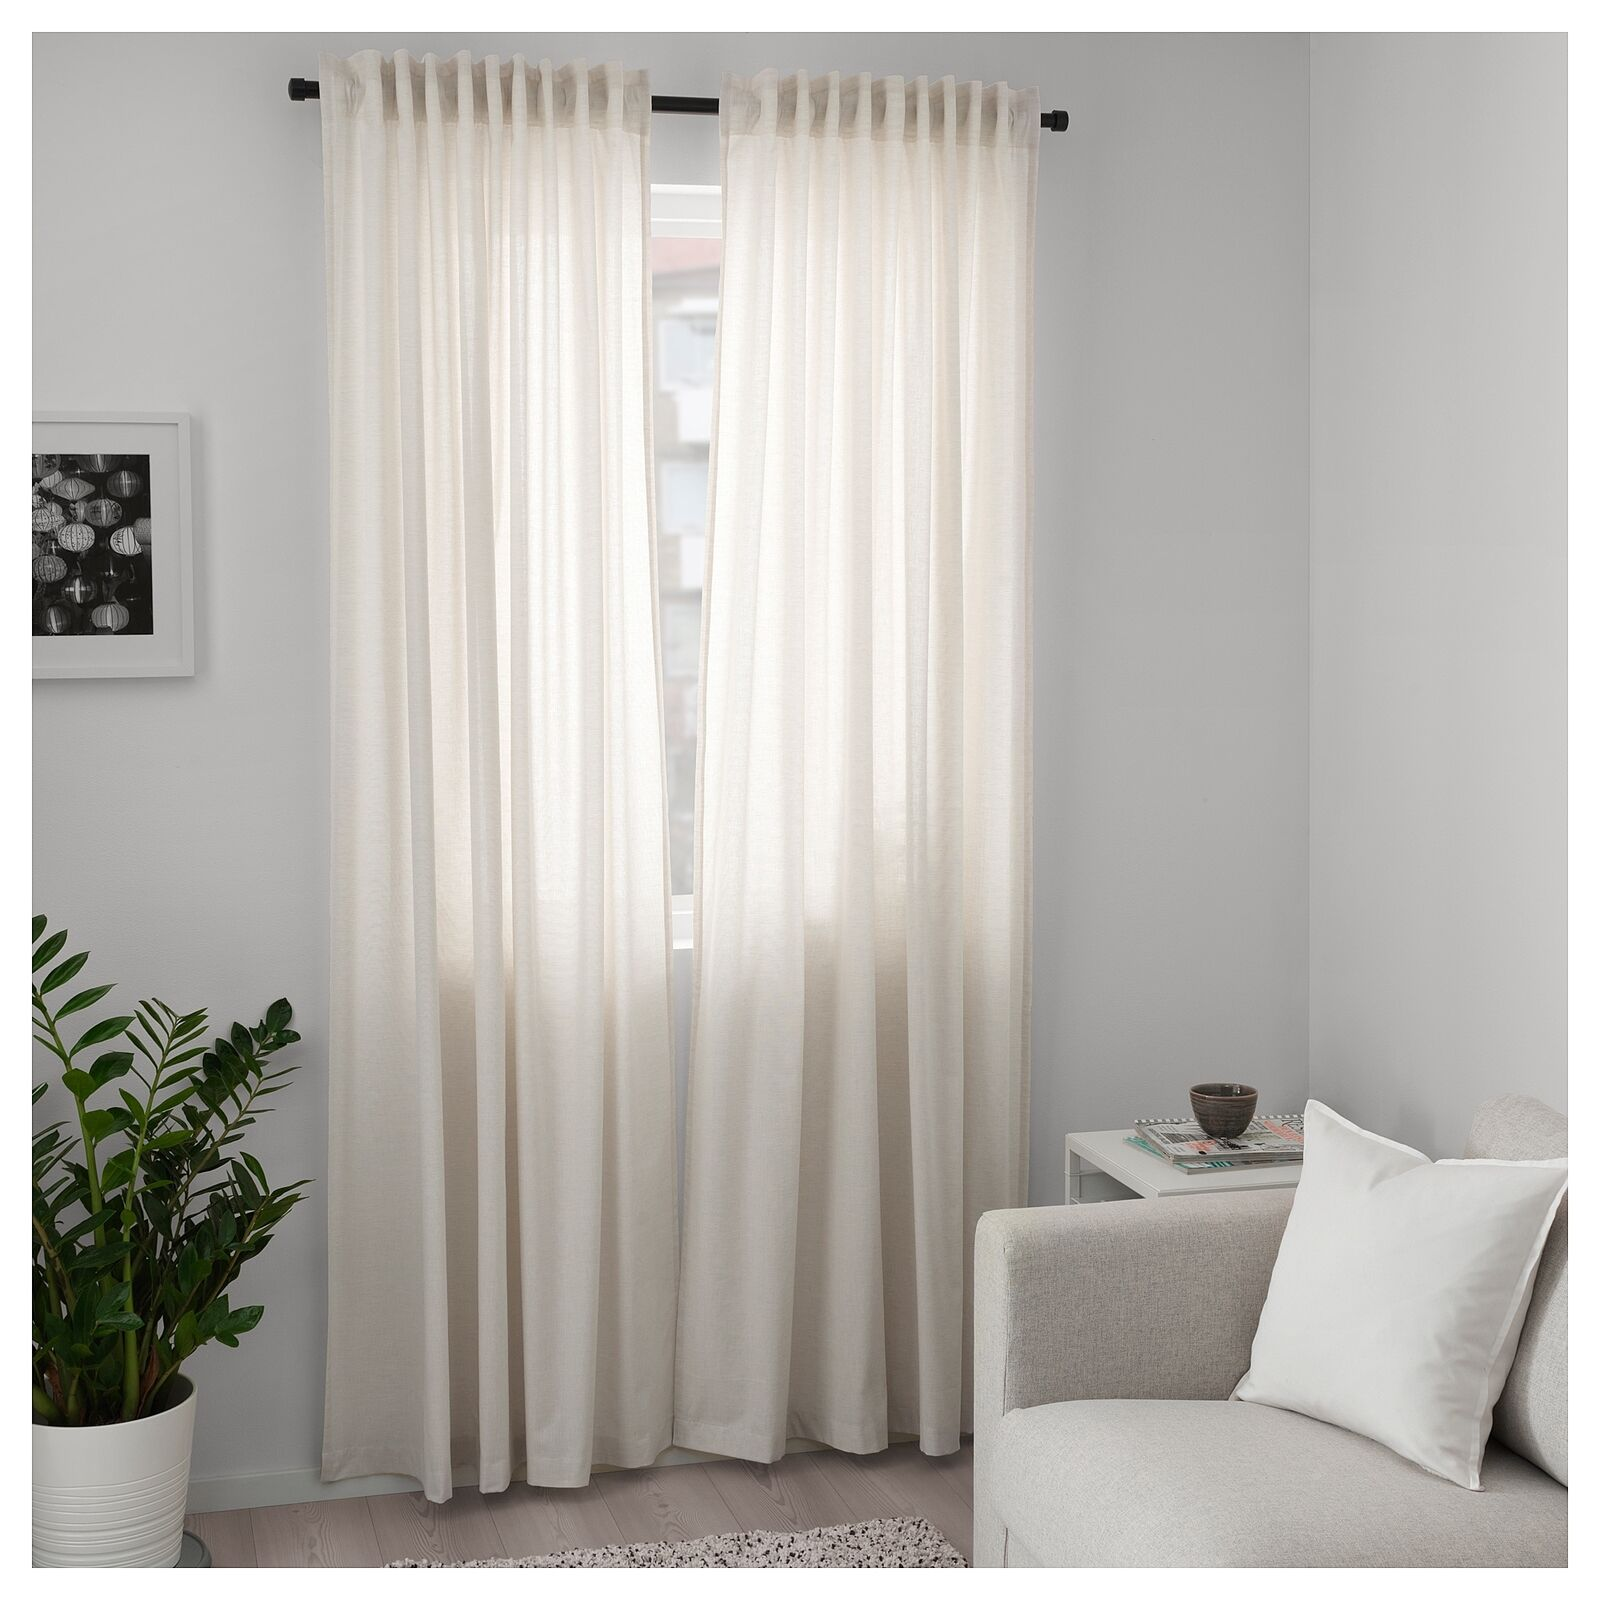 Ikea Curtains and Blinds Bedroom Living Room Room Room Window Sheer Panels 250x145cm Beige d8388f